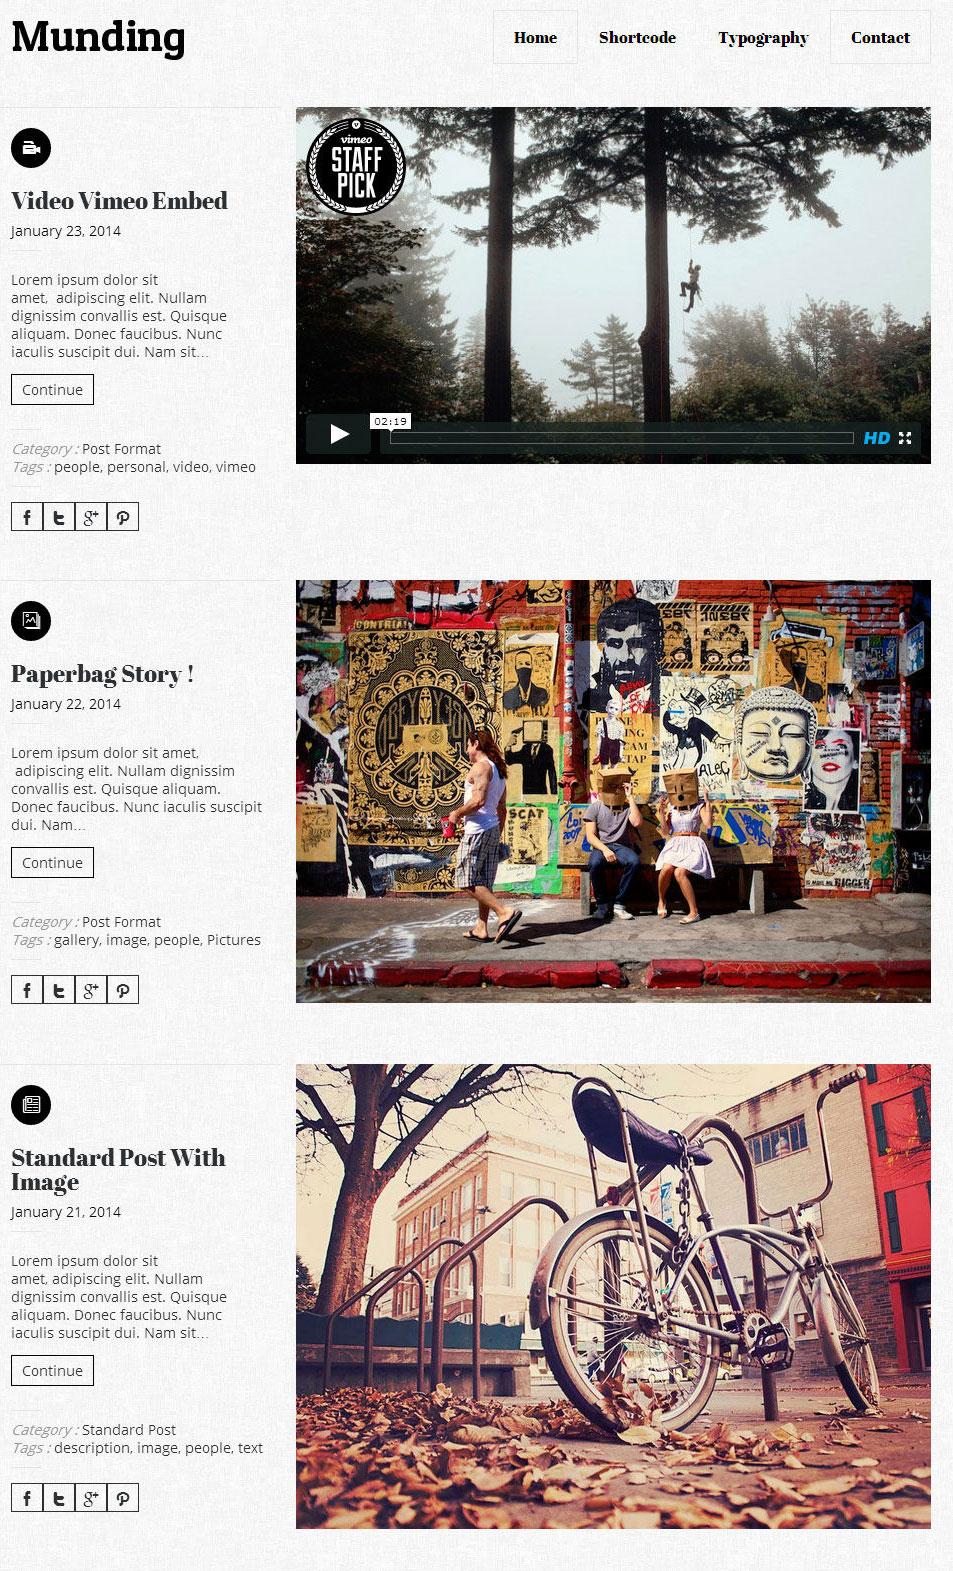 munding-minimalist-responsive-blogging-theme